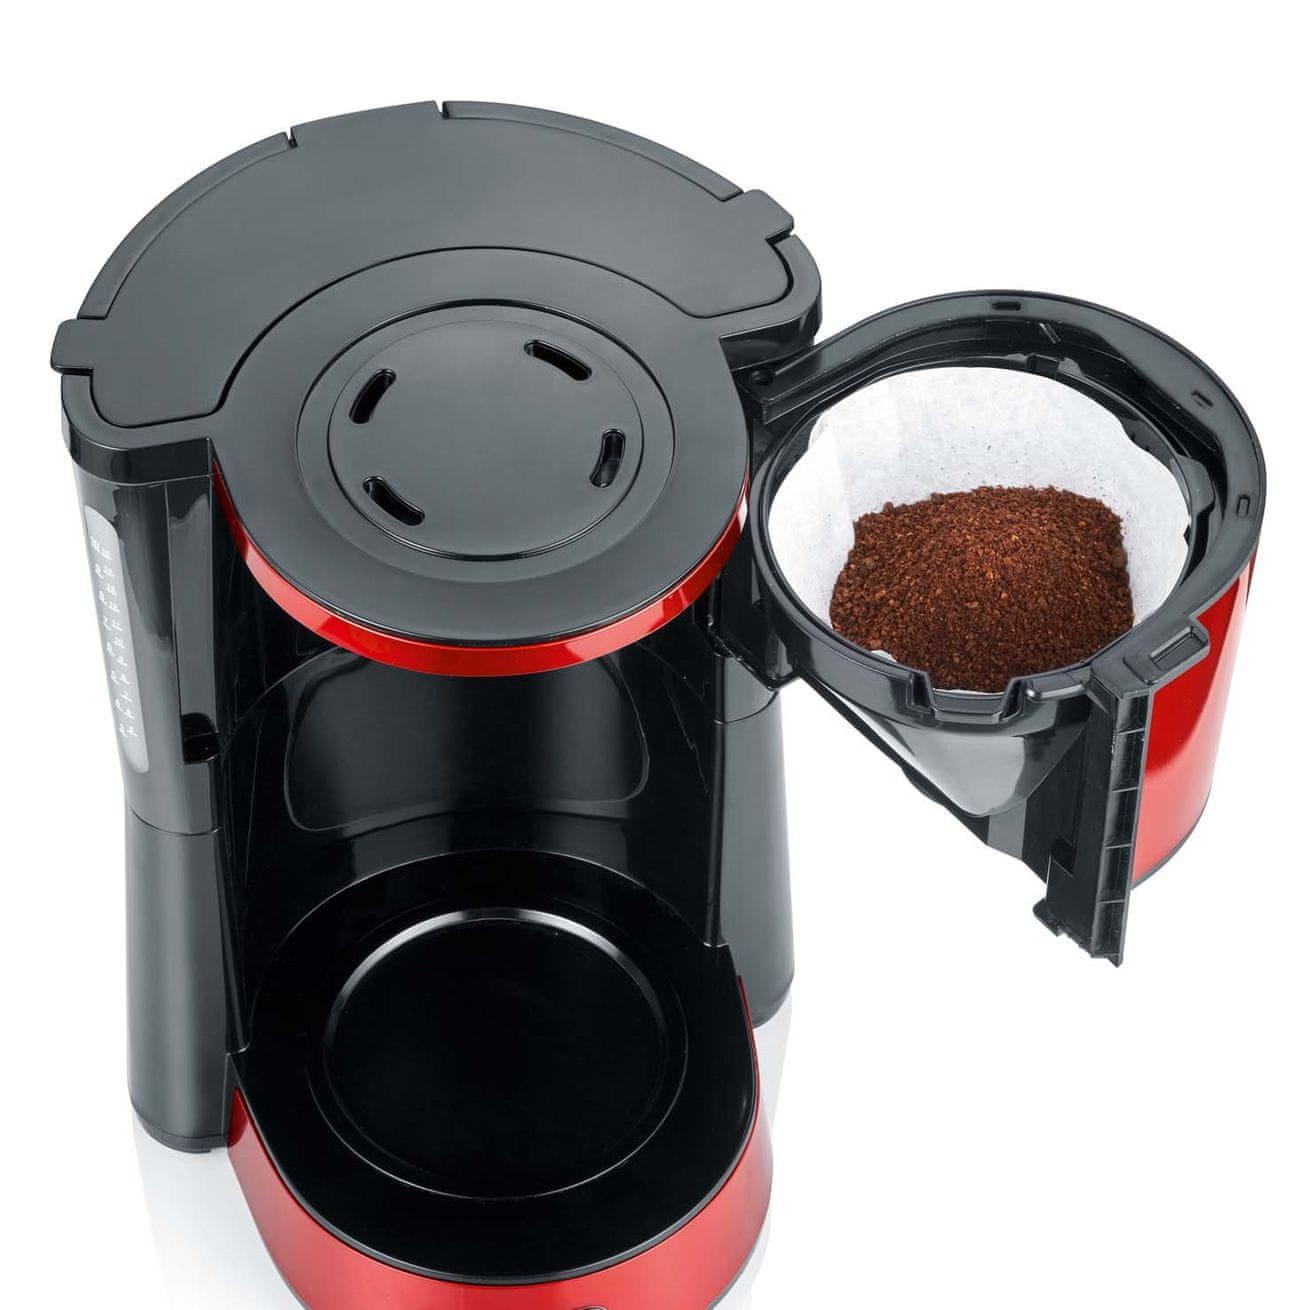 Severin KA 4817 Kávéfőzőgép